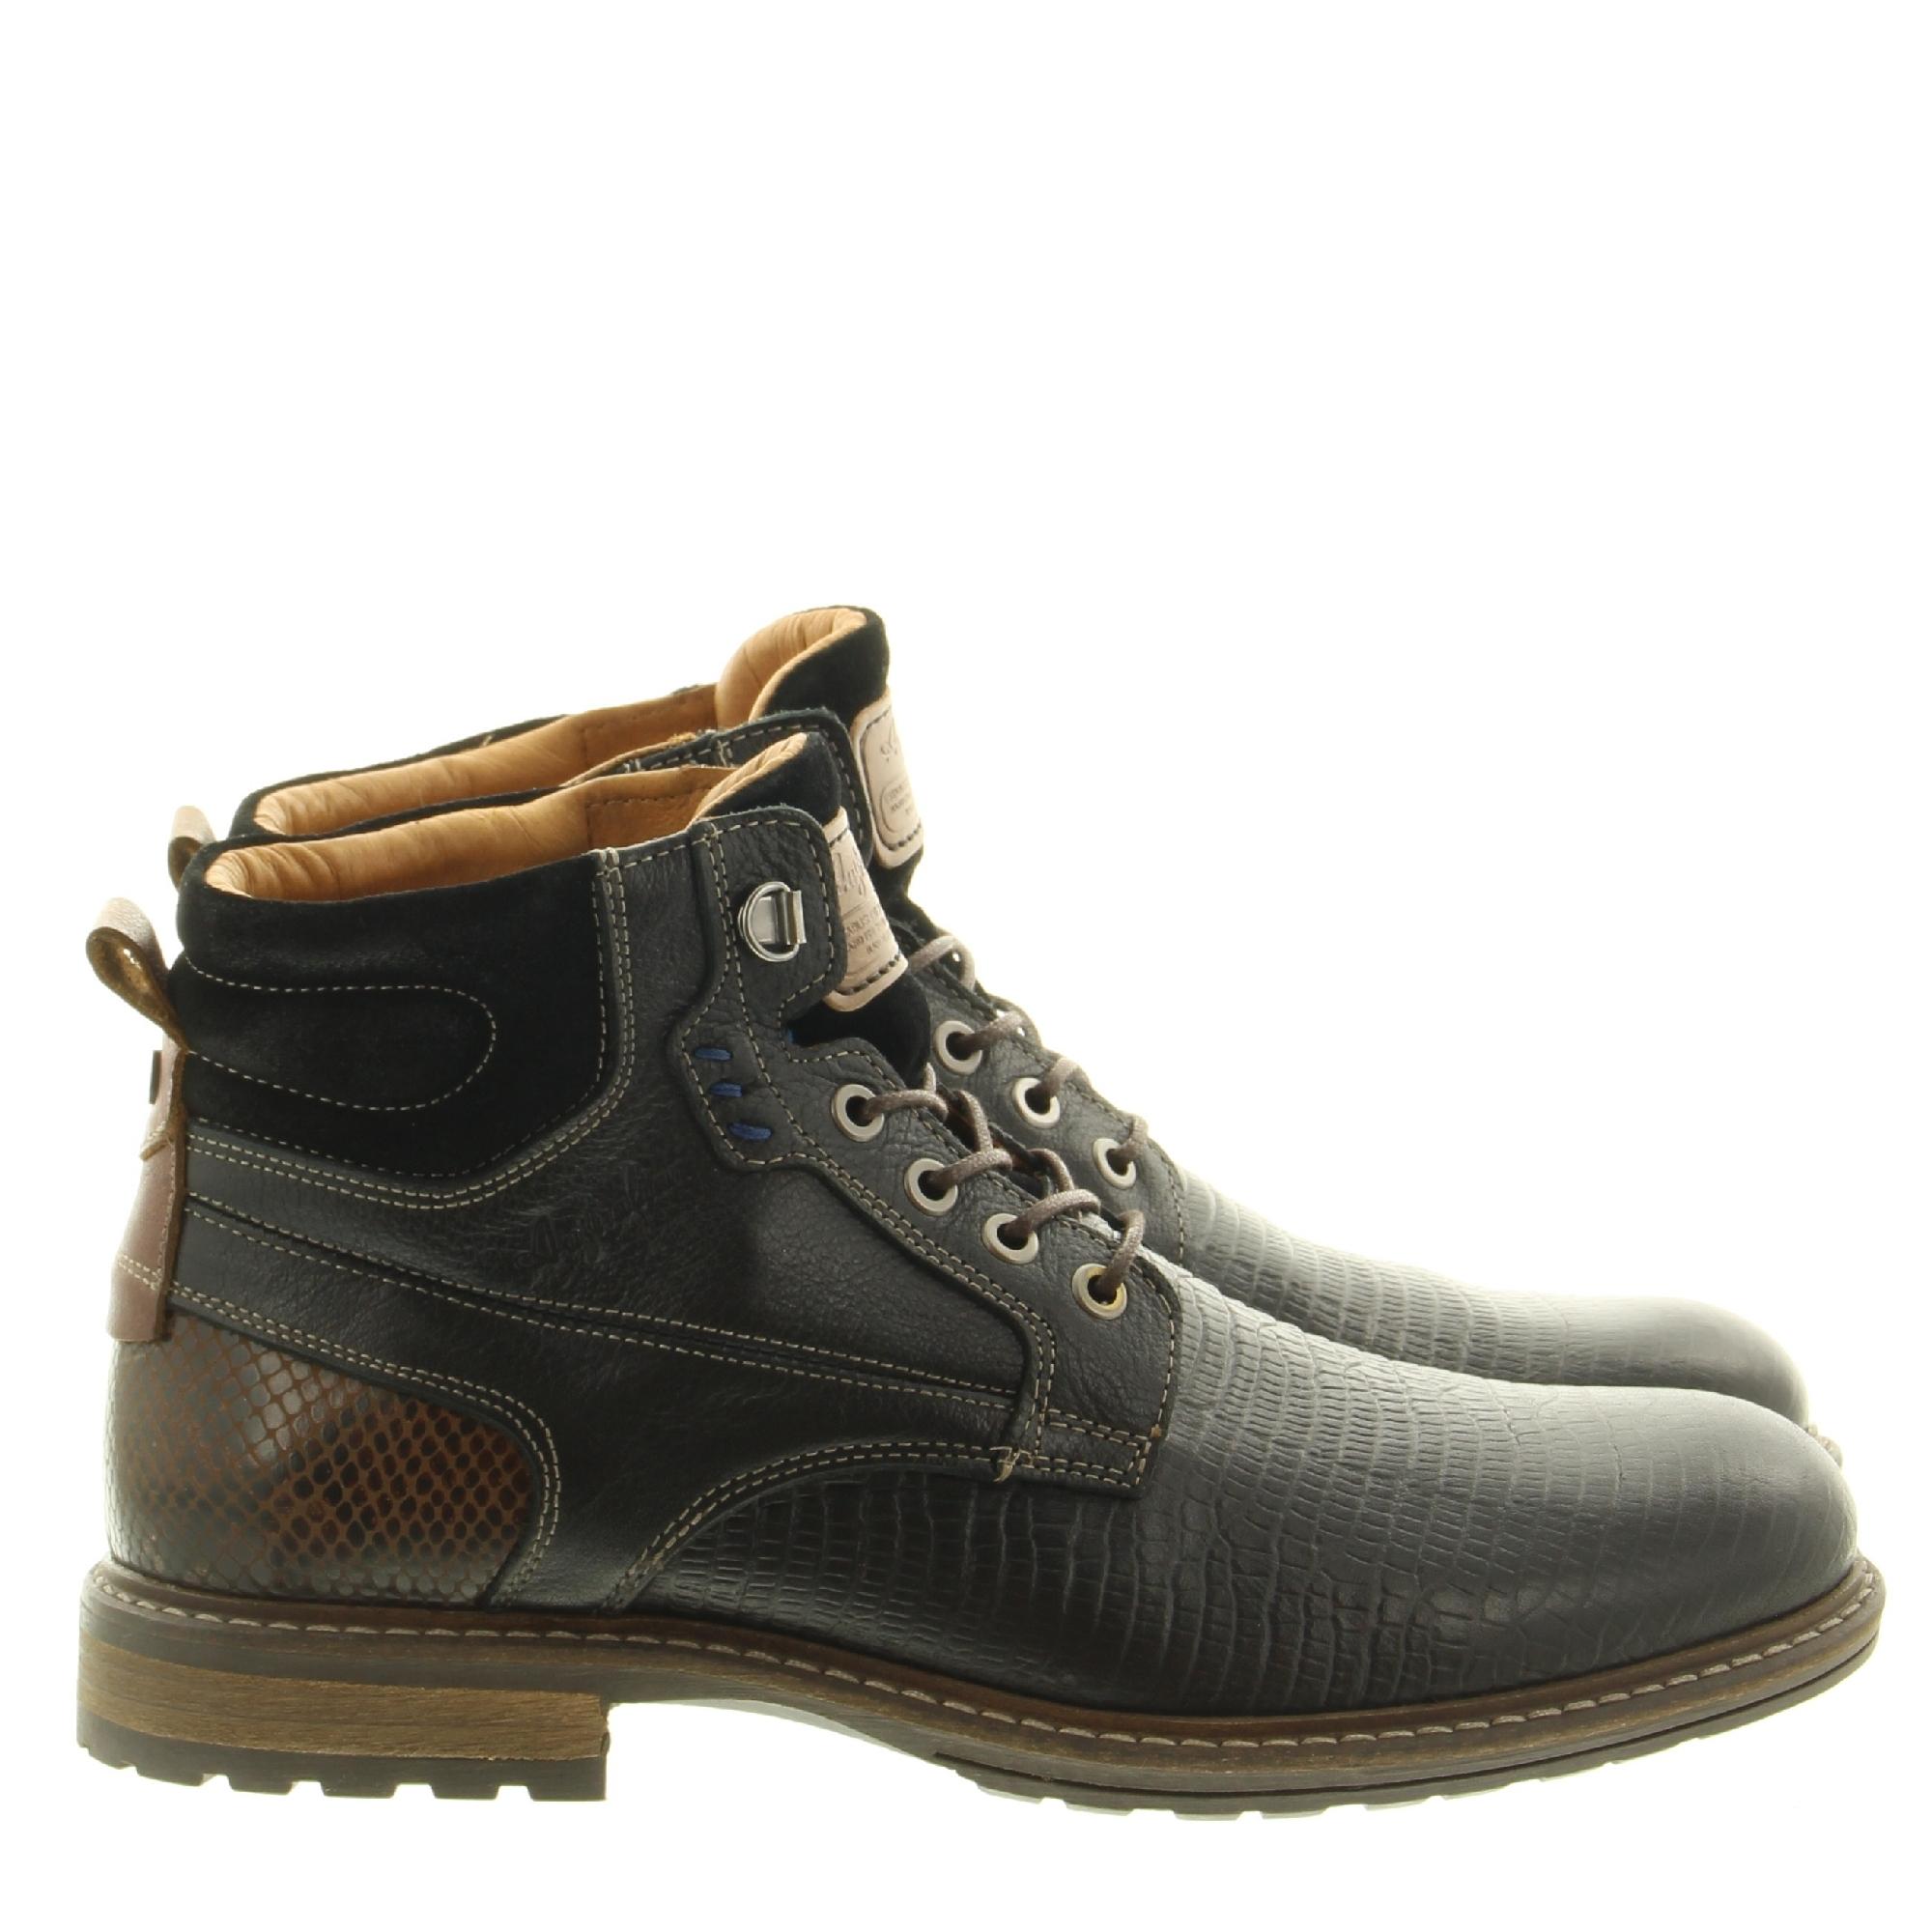 Australian Footwear Rick 15.1492.01 A15 Black Tan